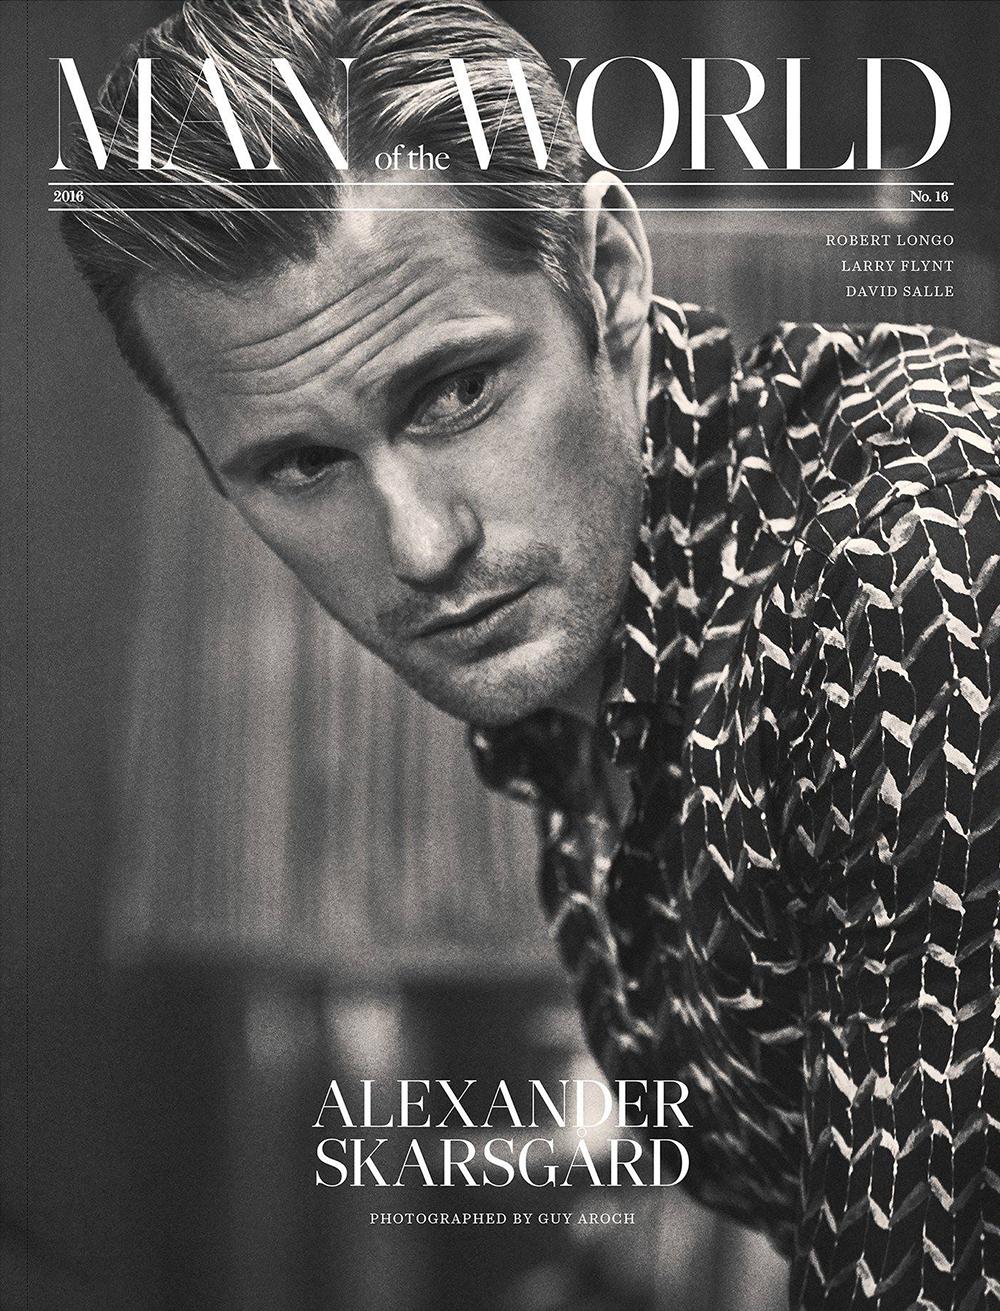 Alexander Skarsgård by Guy Aroch for Man of the World #16